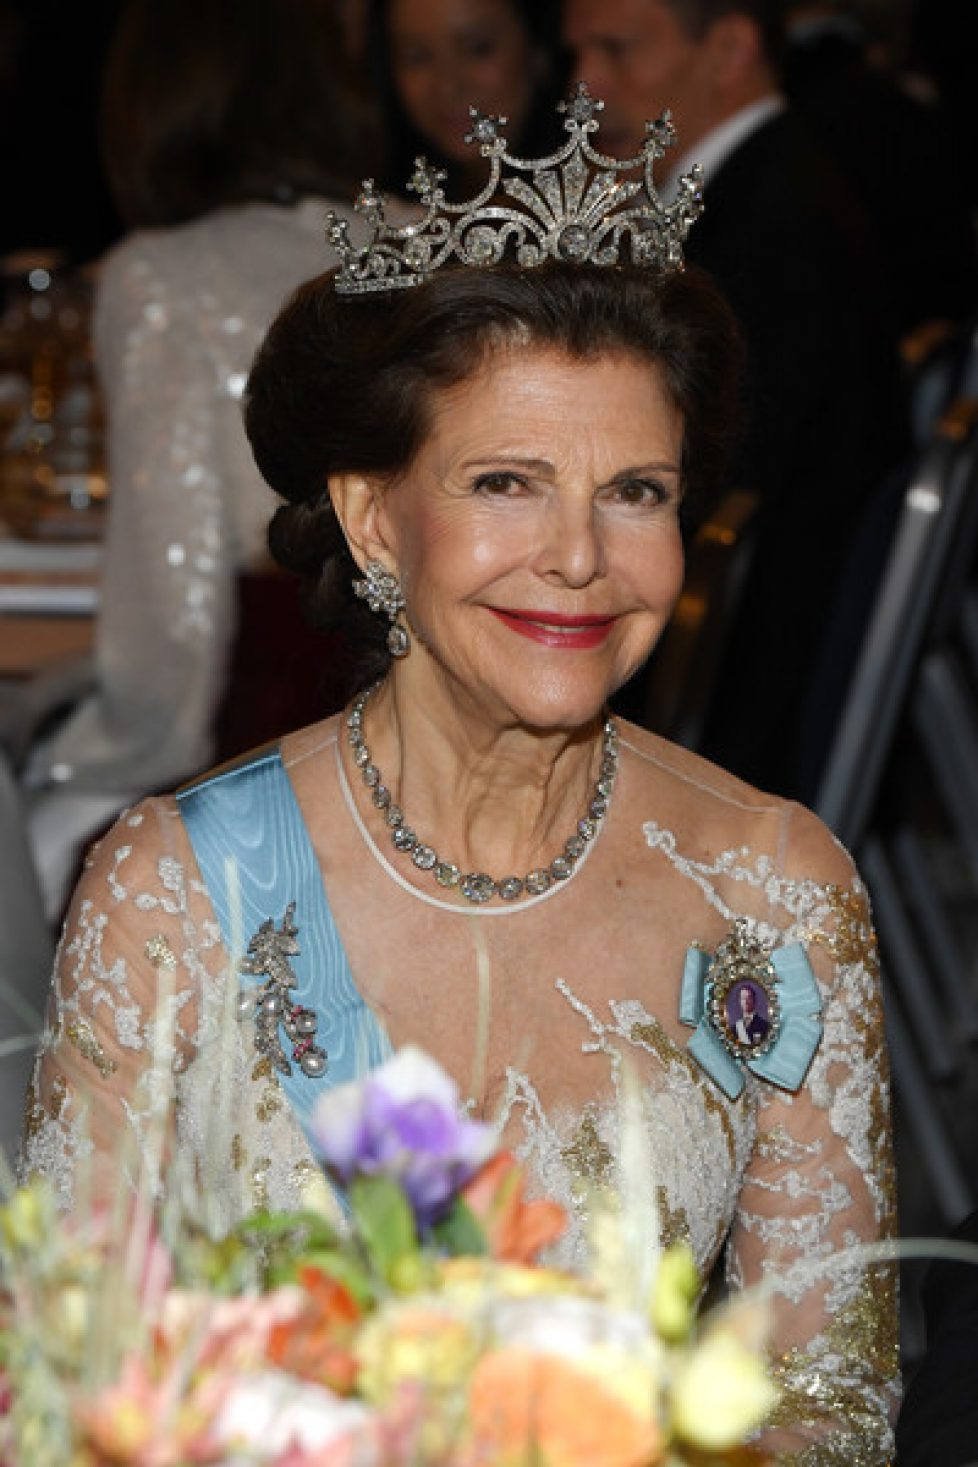 Nobel+Prize+Banquet+2019+Stockholm+kJQUDAIaeG3l